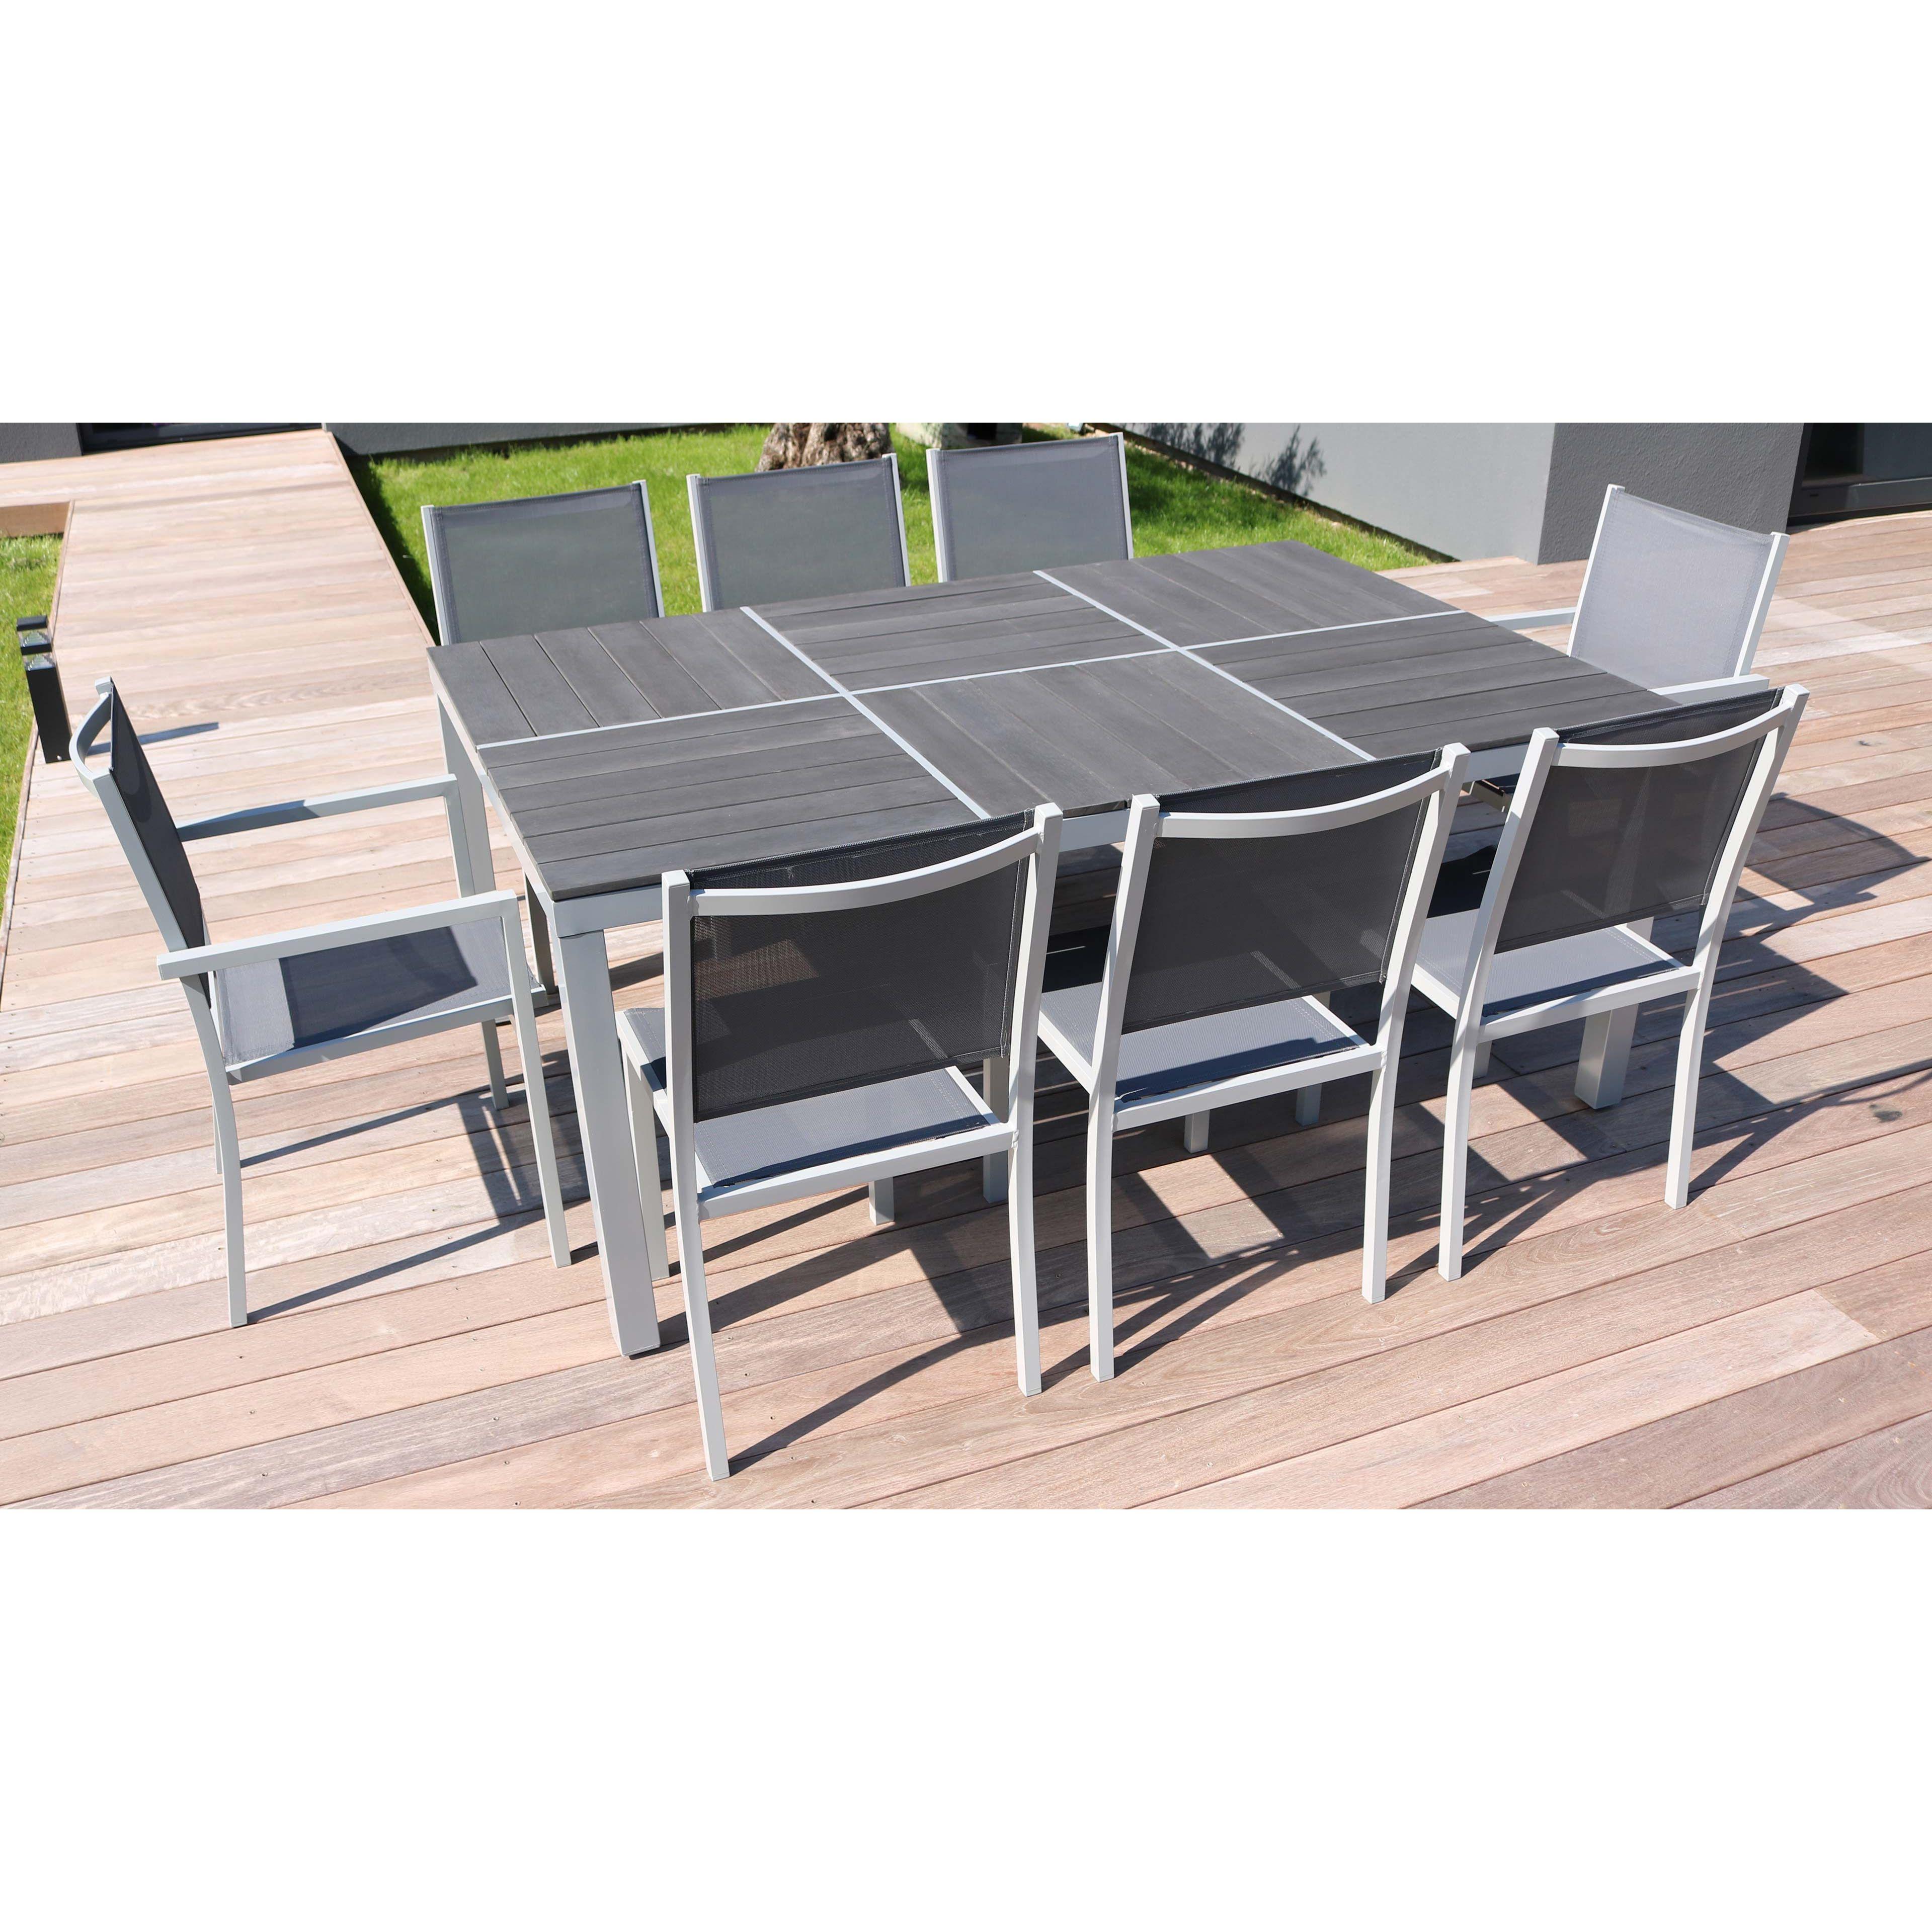 Salon jardin aluminium 1 table et 8 fauteuils textilène